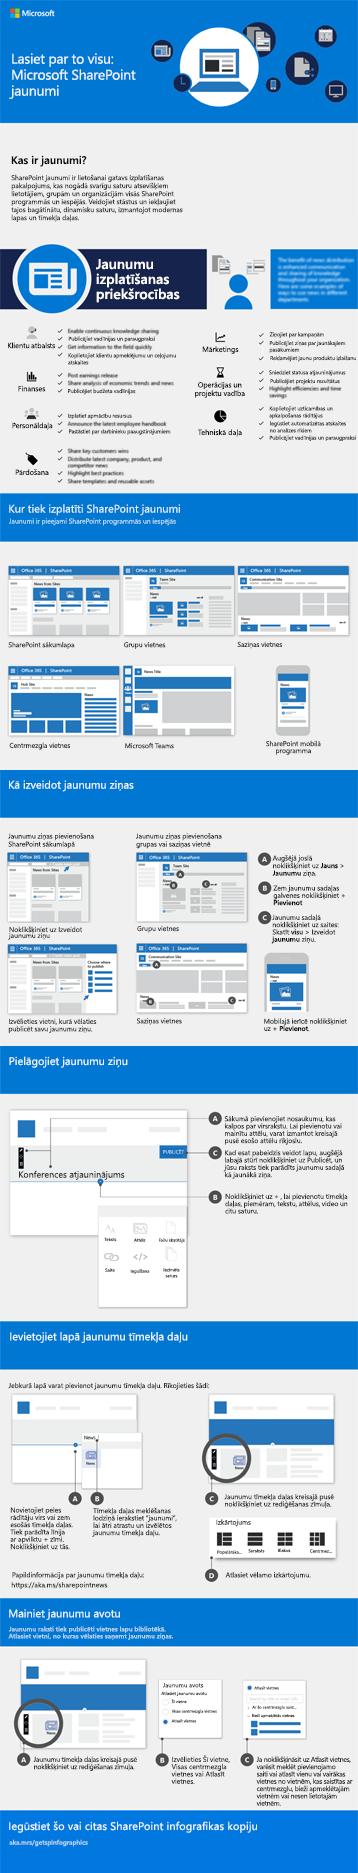 SharePoint jaunumu infografika